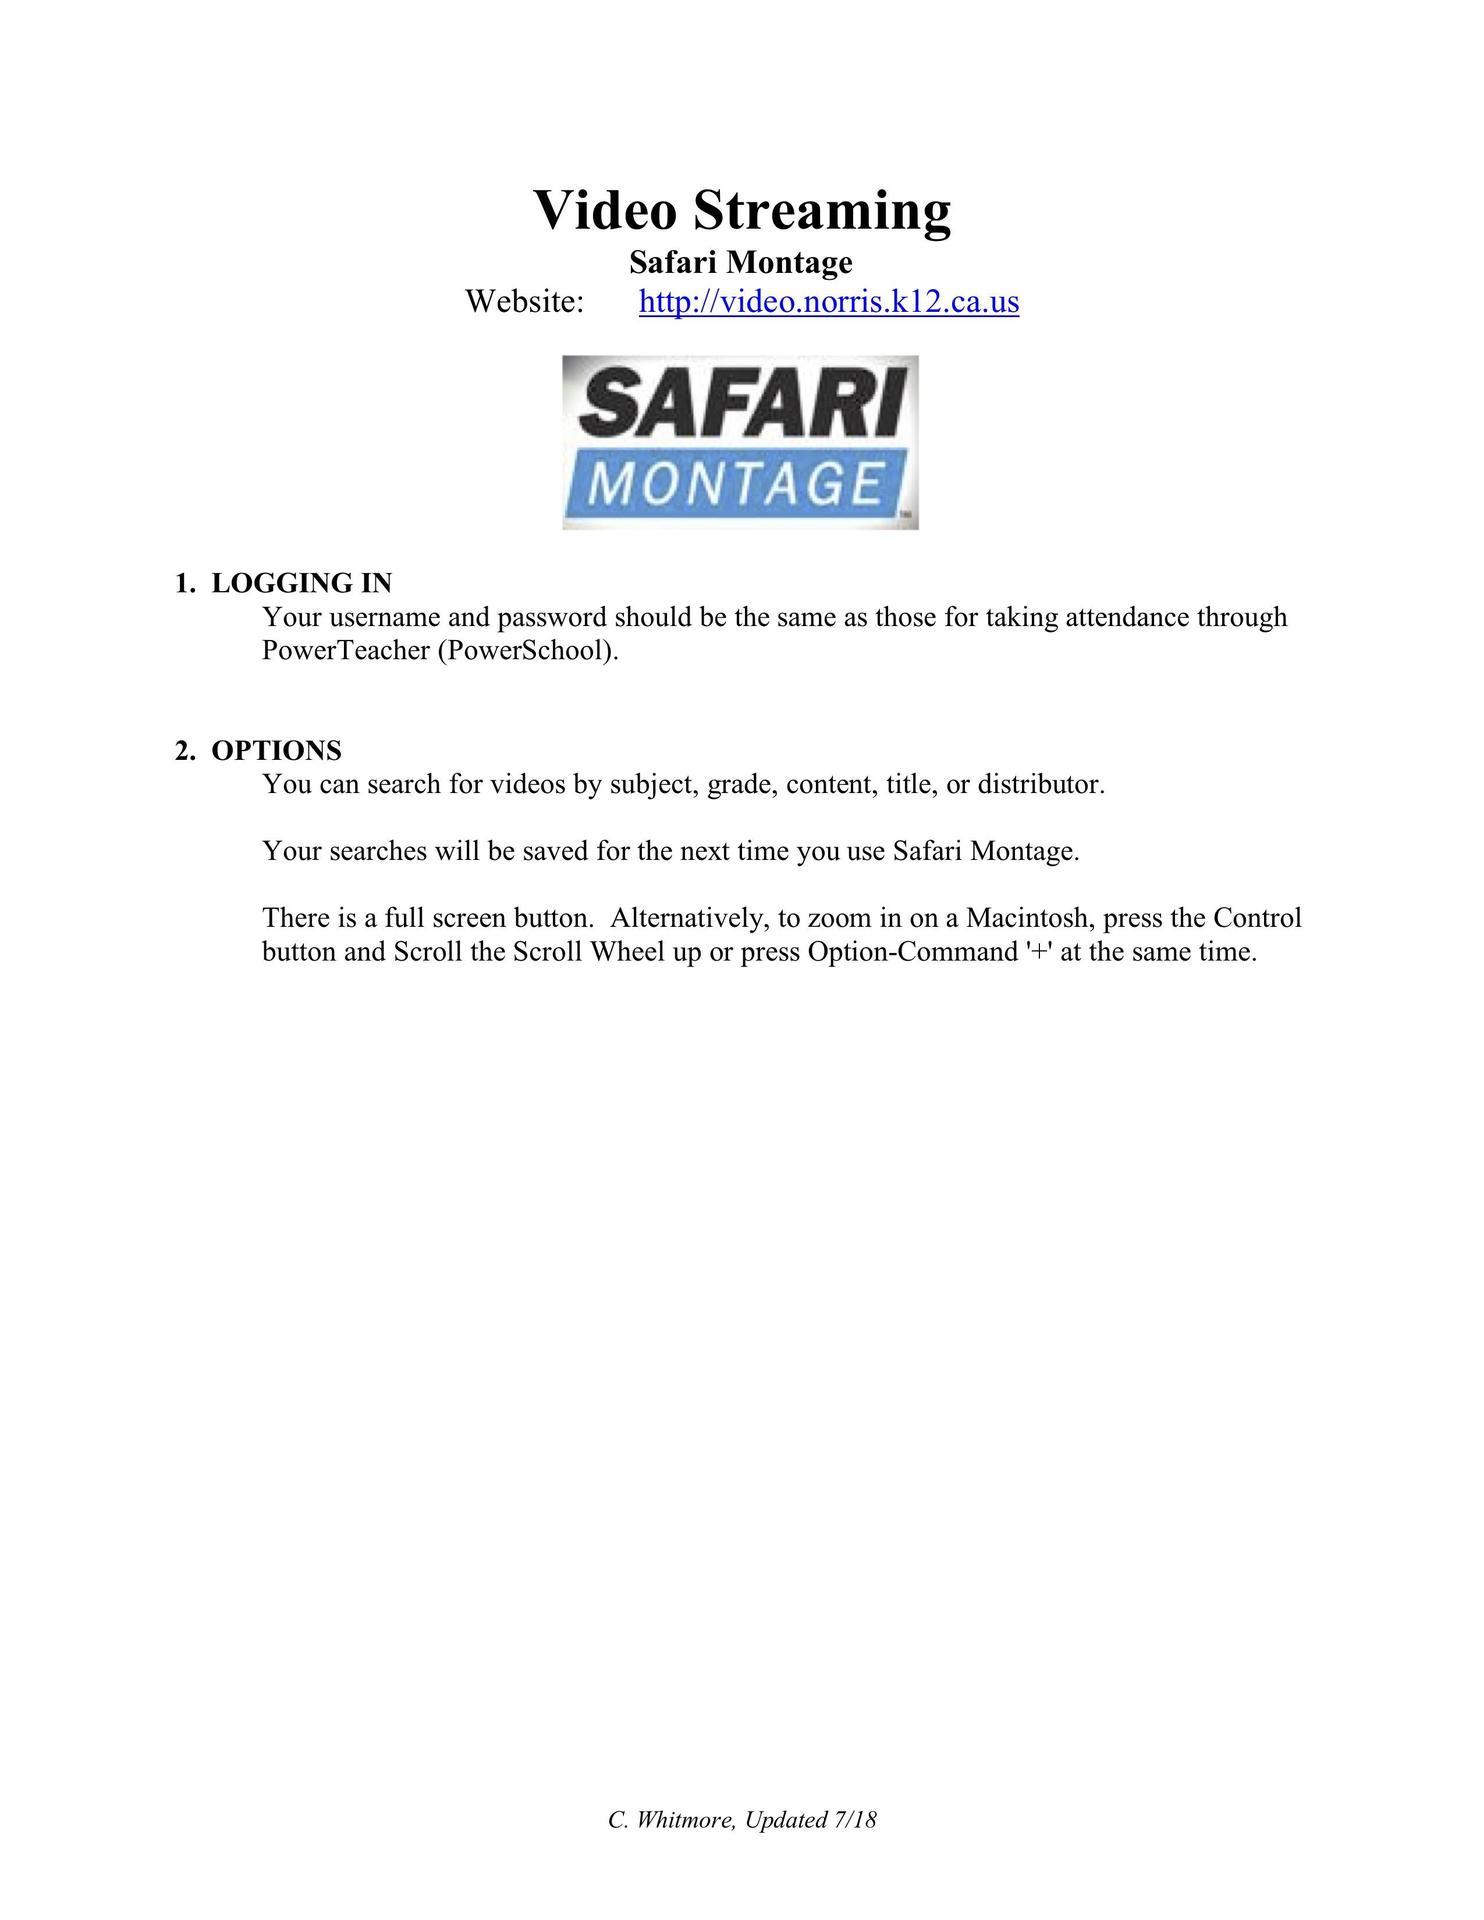 safari montage help